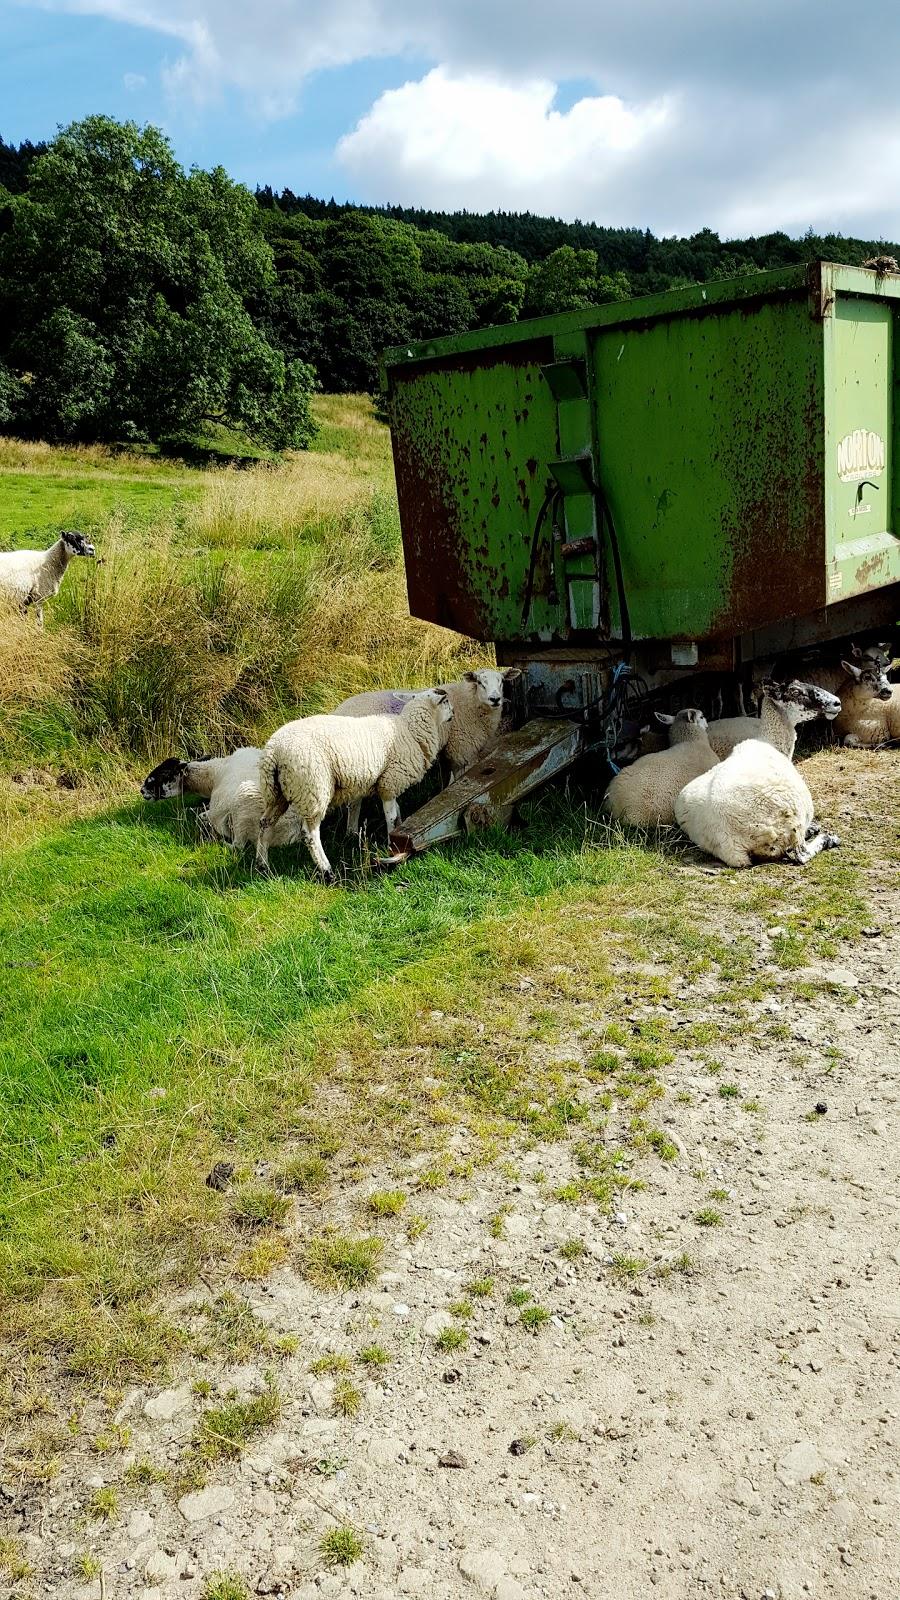 Sheep : Weekend Blog Hop